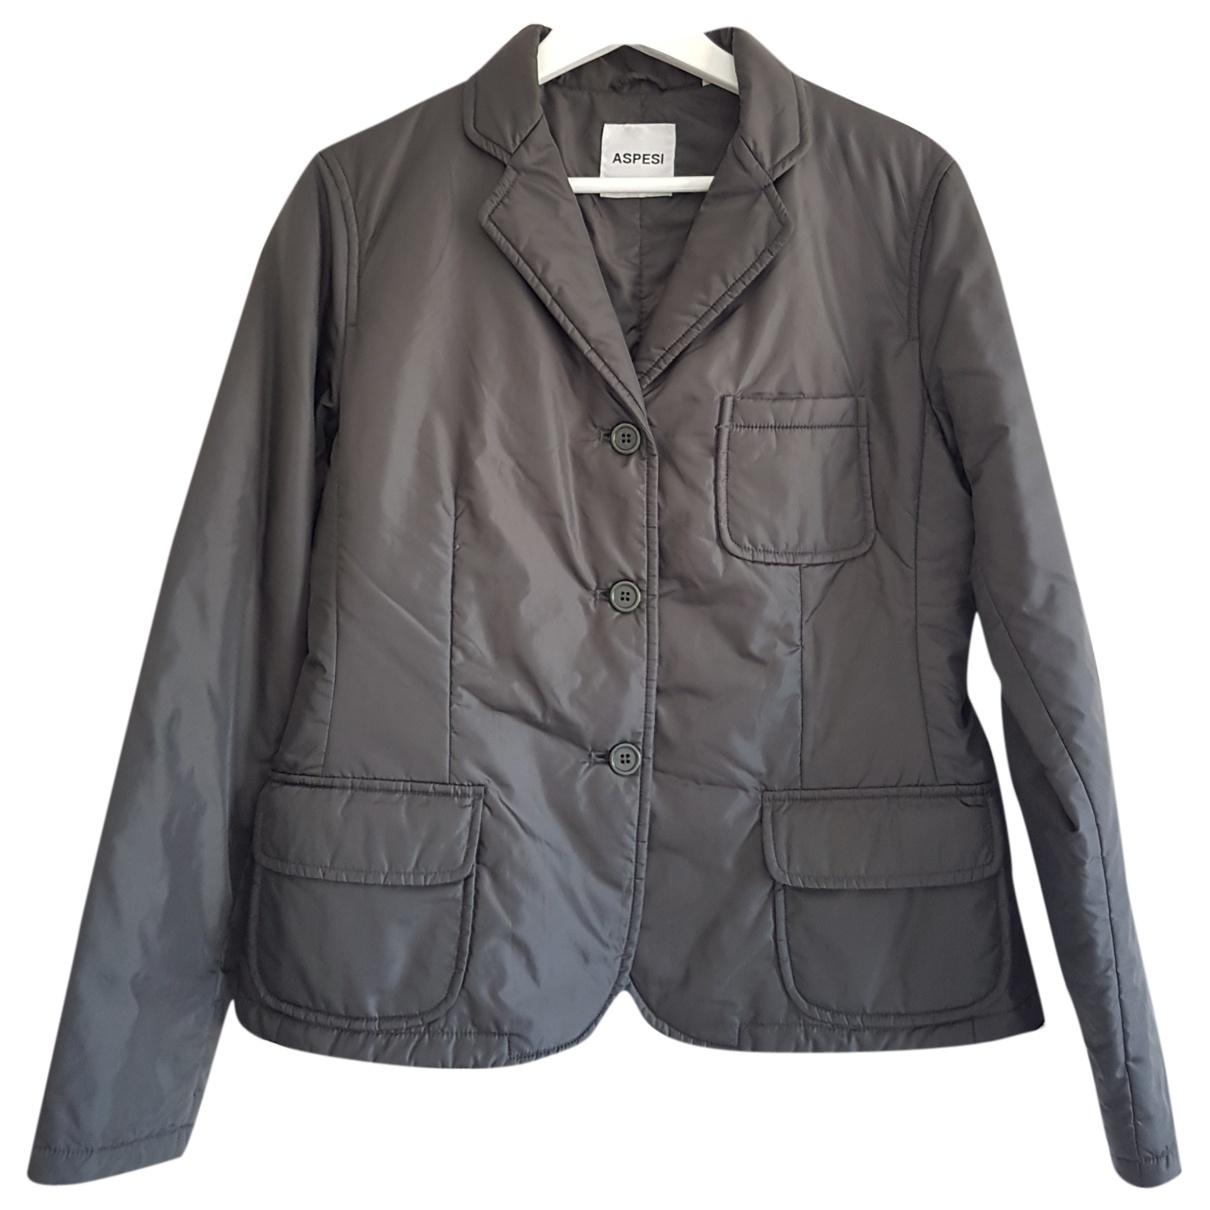 Aspesi \N Grey jacket for Women L International